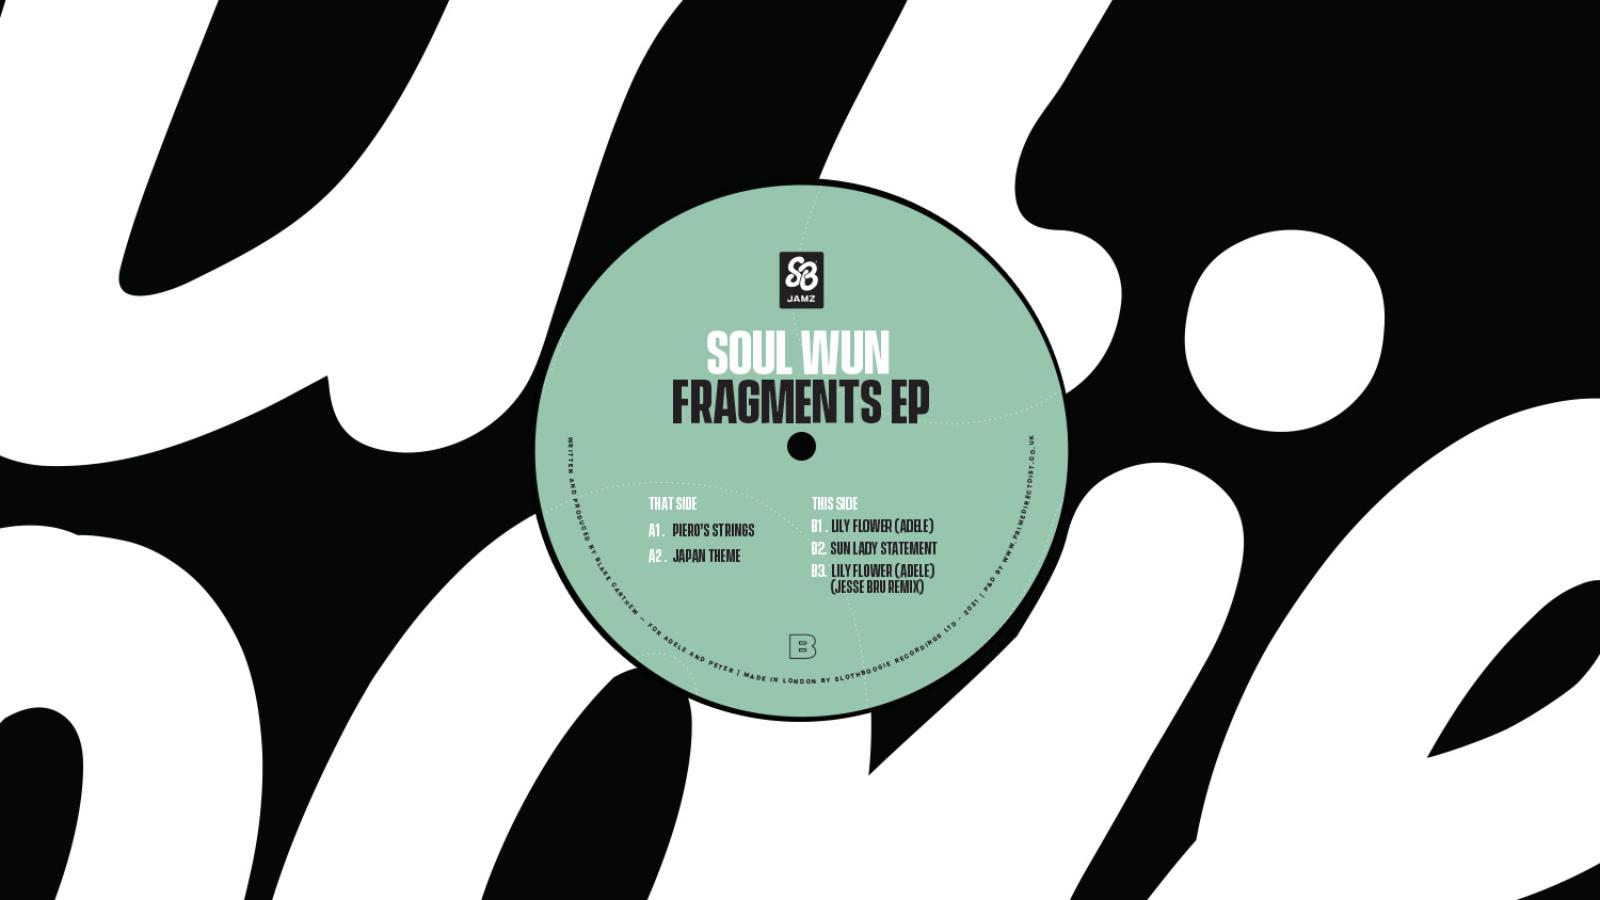 SBJAMZ007-Vinyl-Mock-Up-B